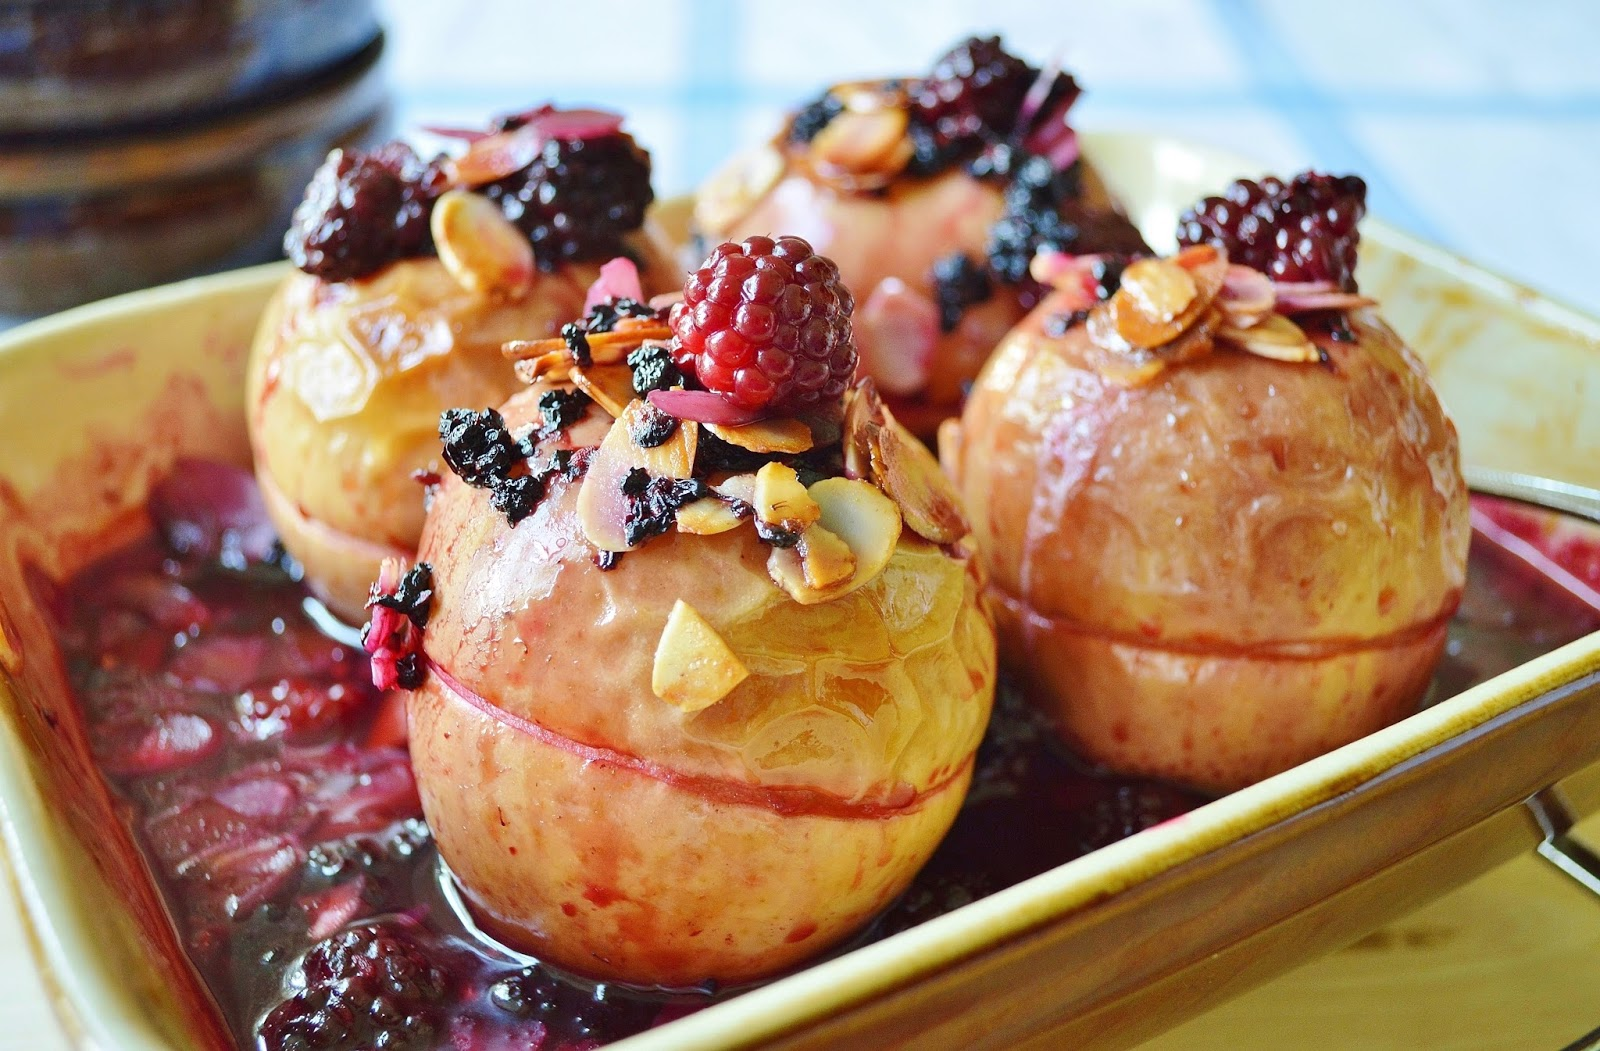 Gluten Free SCD and Veggie: Blackberry Stuffed Baked Apples GF SCD